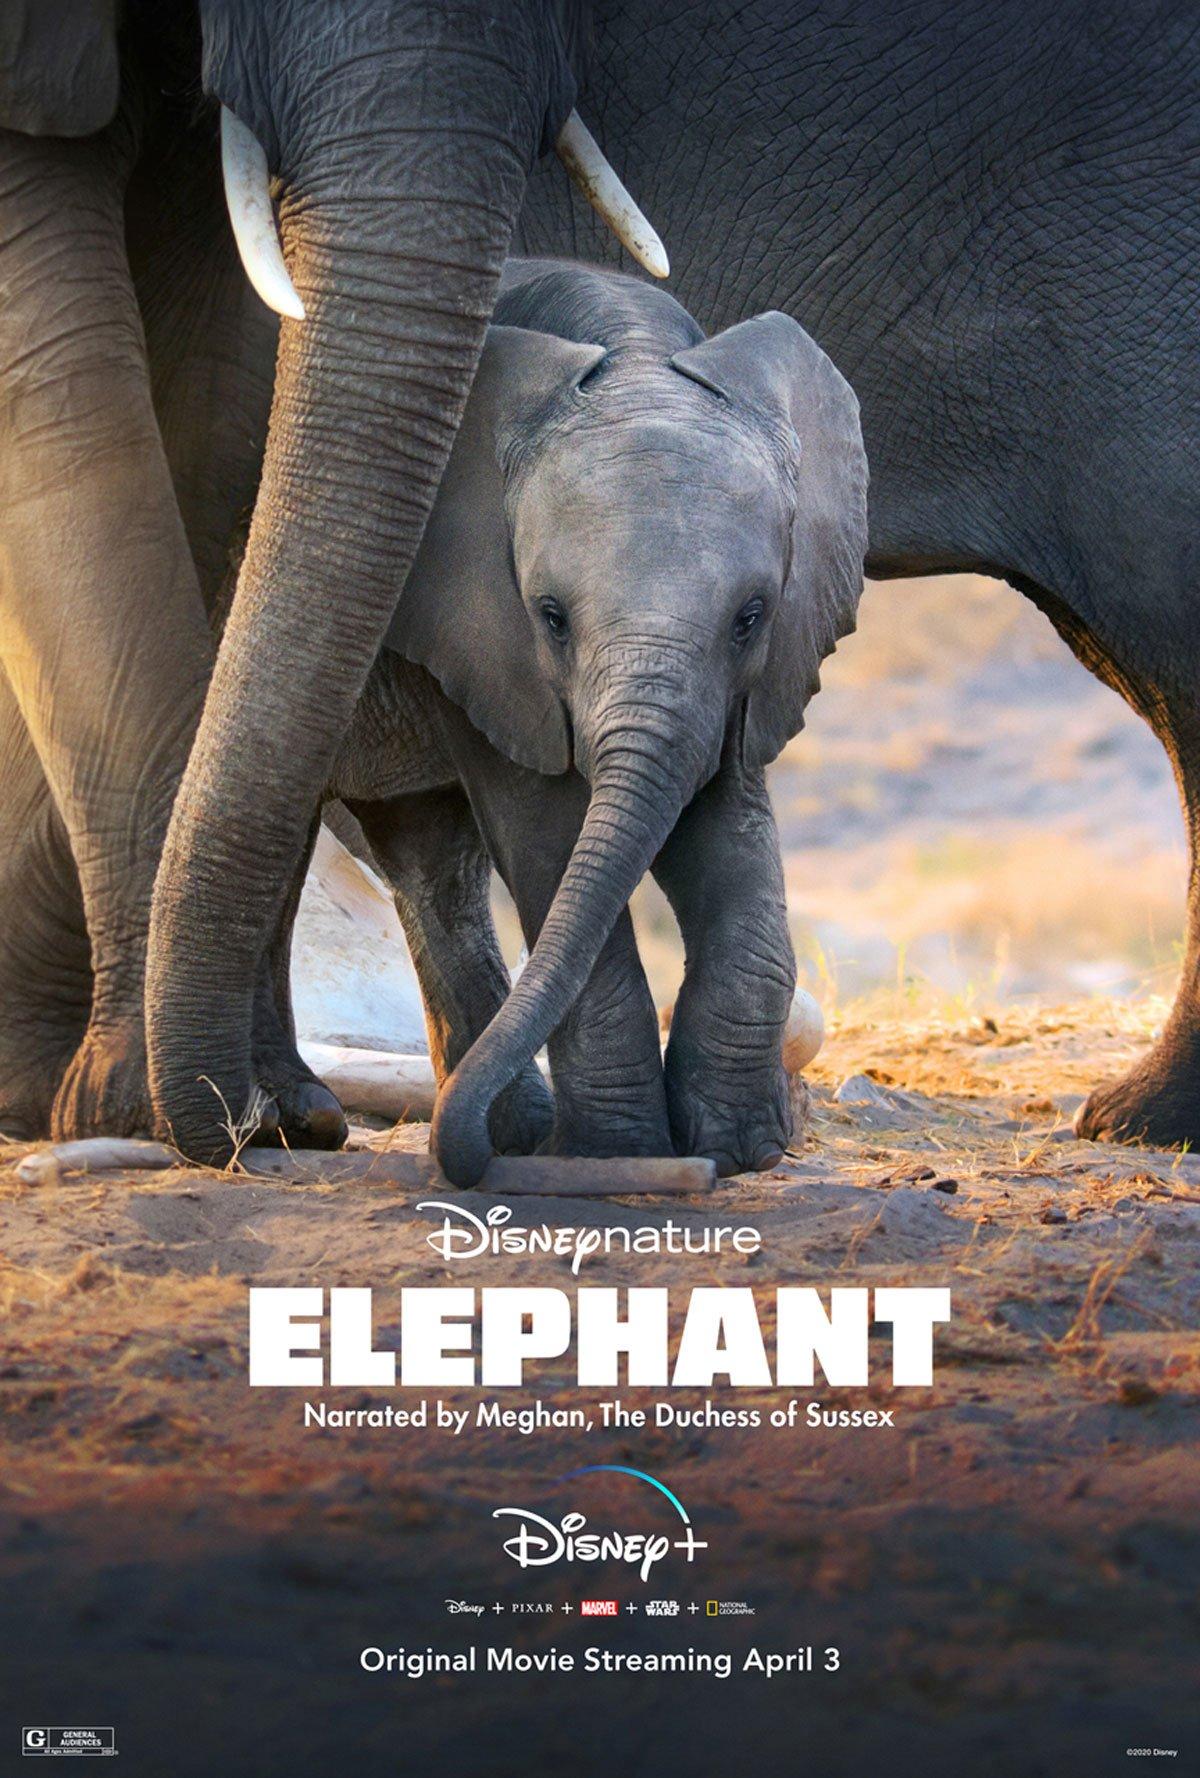 Elephant poster on Disney+